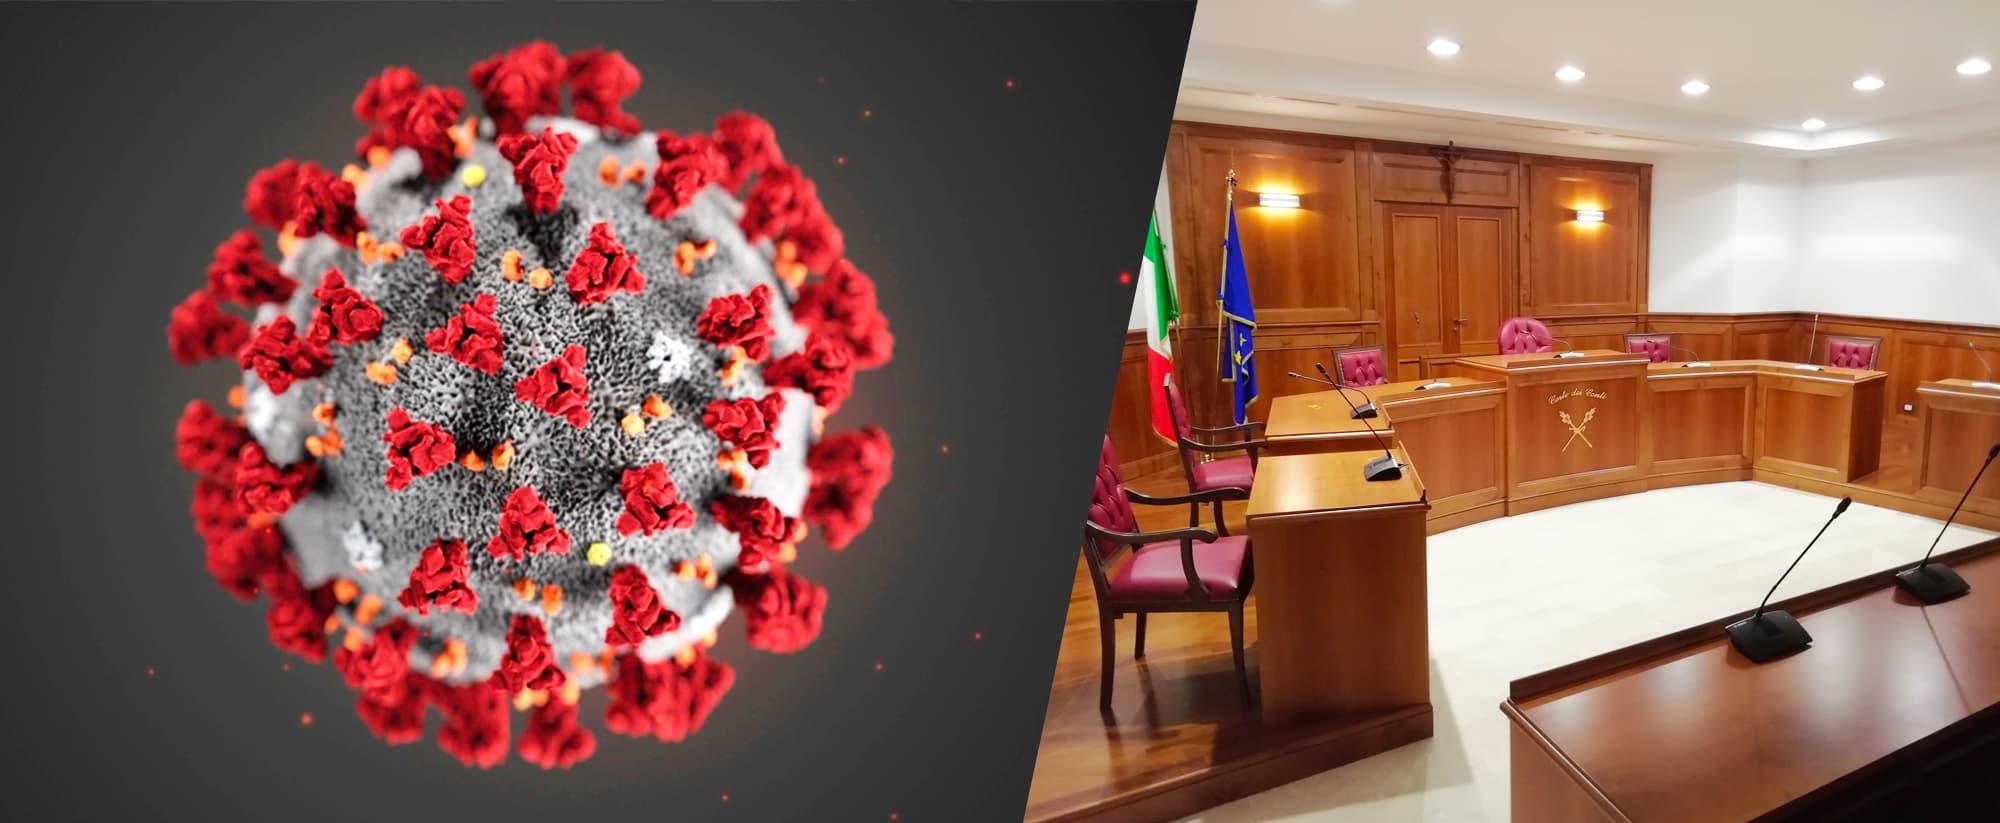 gli effetti dovuti al Coronavirus